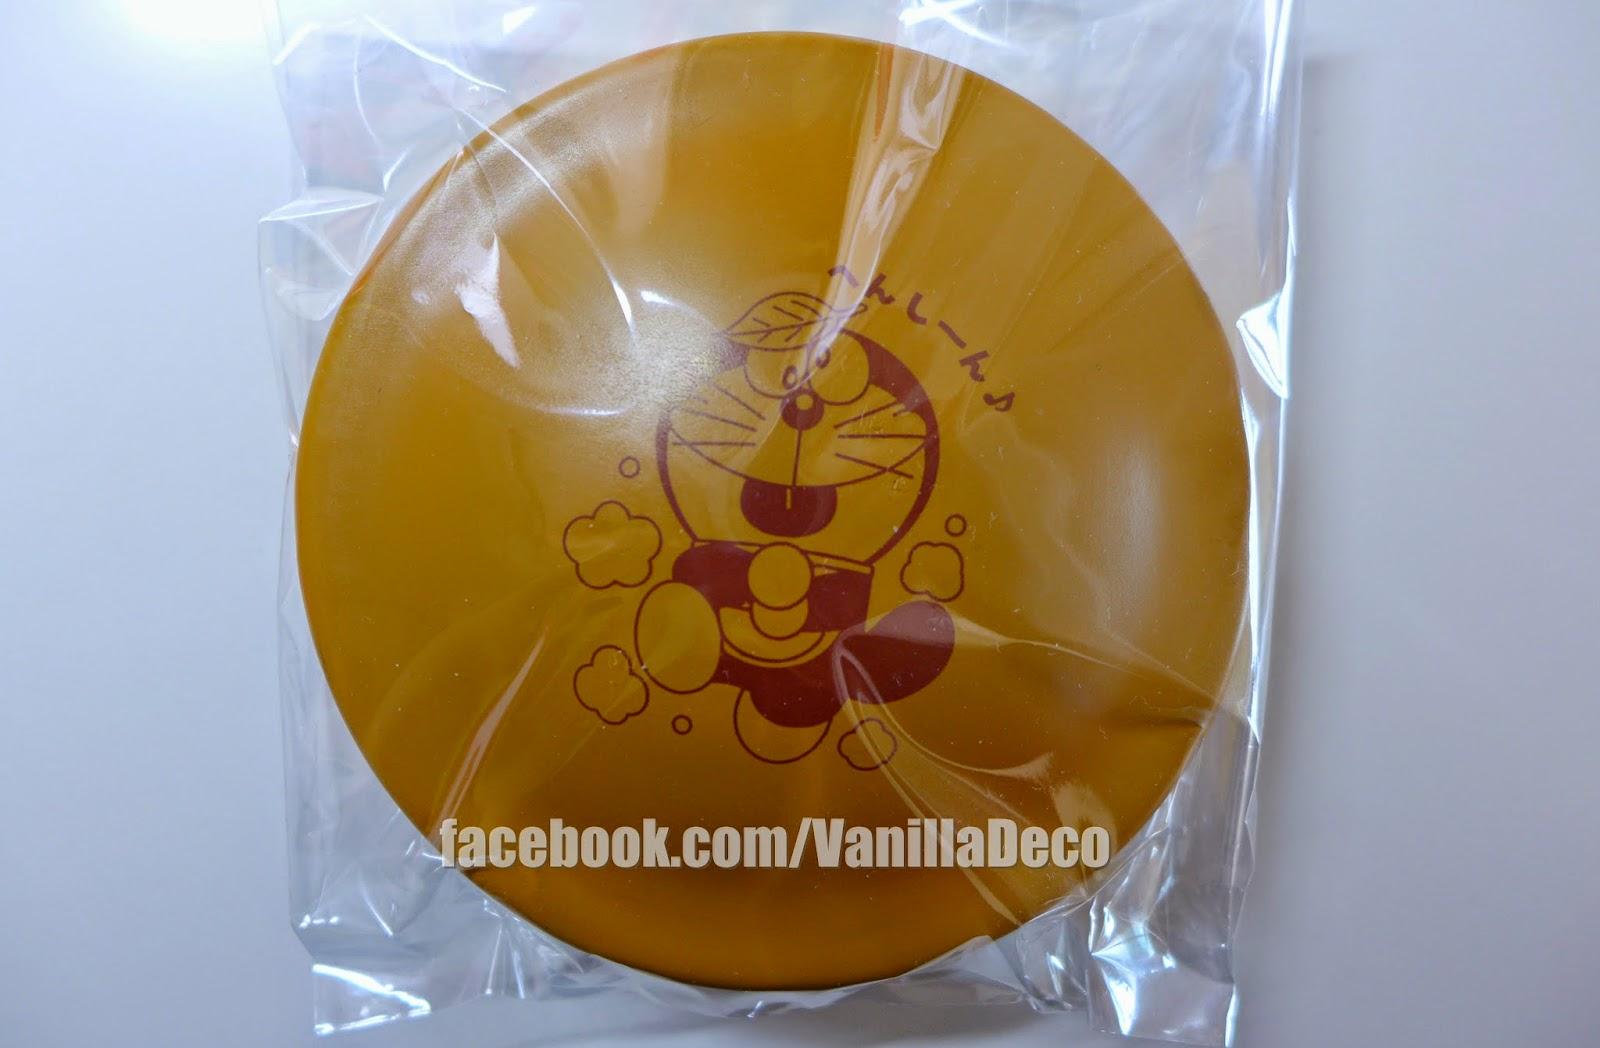 Doraemon Dorayaki Squishy : Sue s Cutie Closet : Squishy Update: Doraemon Dorayaki, Corn Stick, Mini Apple Squishy